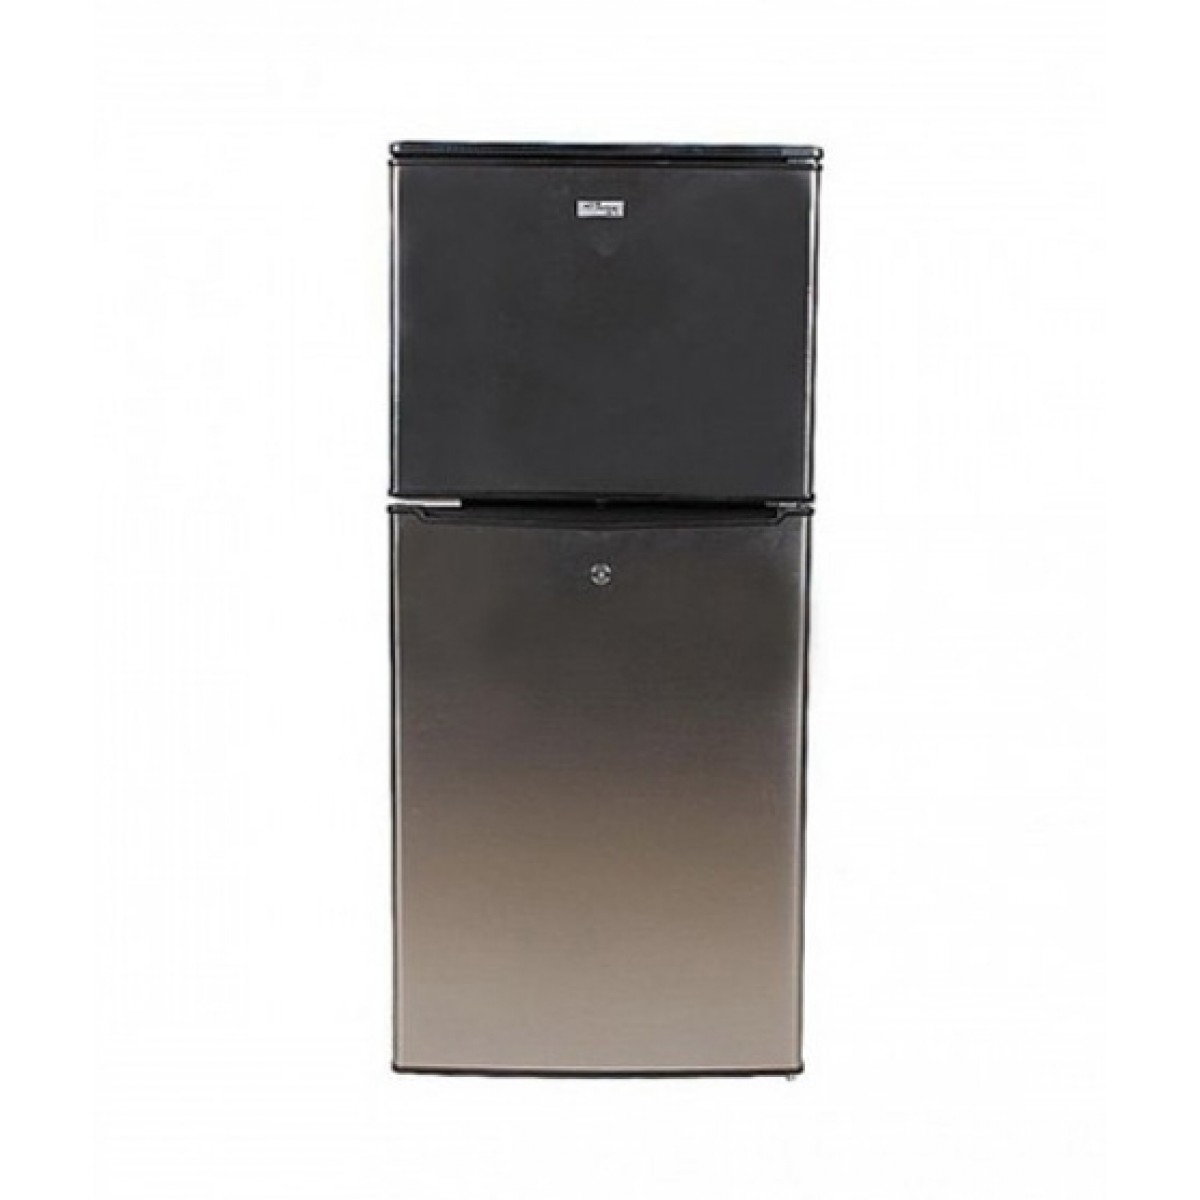 Gaba National Double Door Refrigerator (GNR-188-SS)